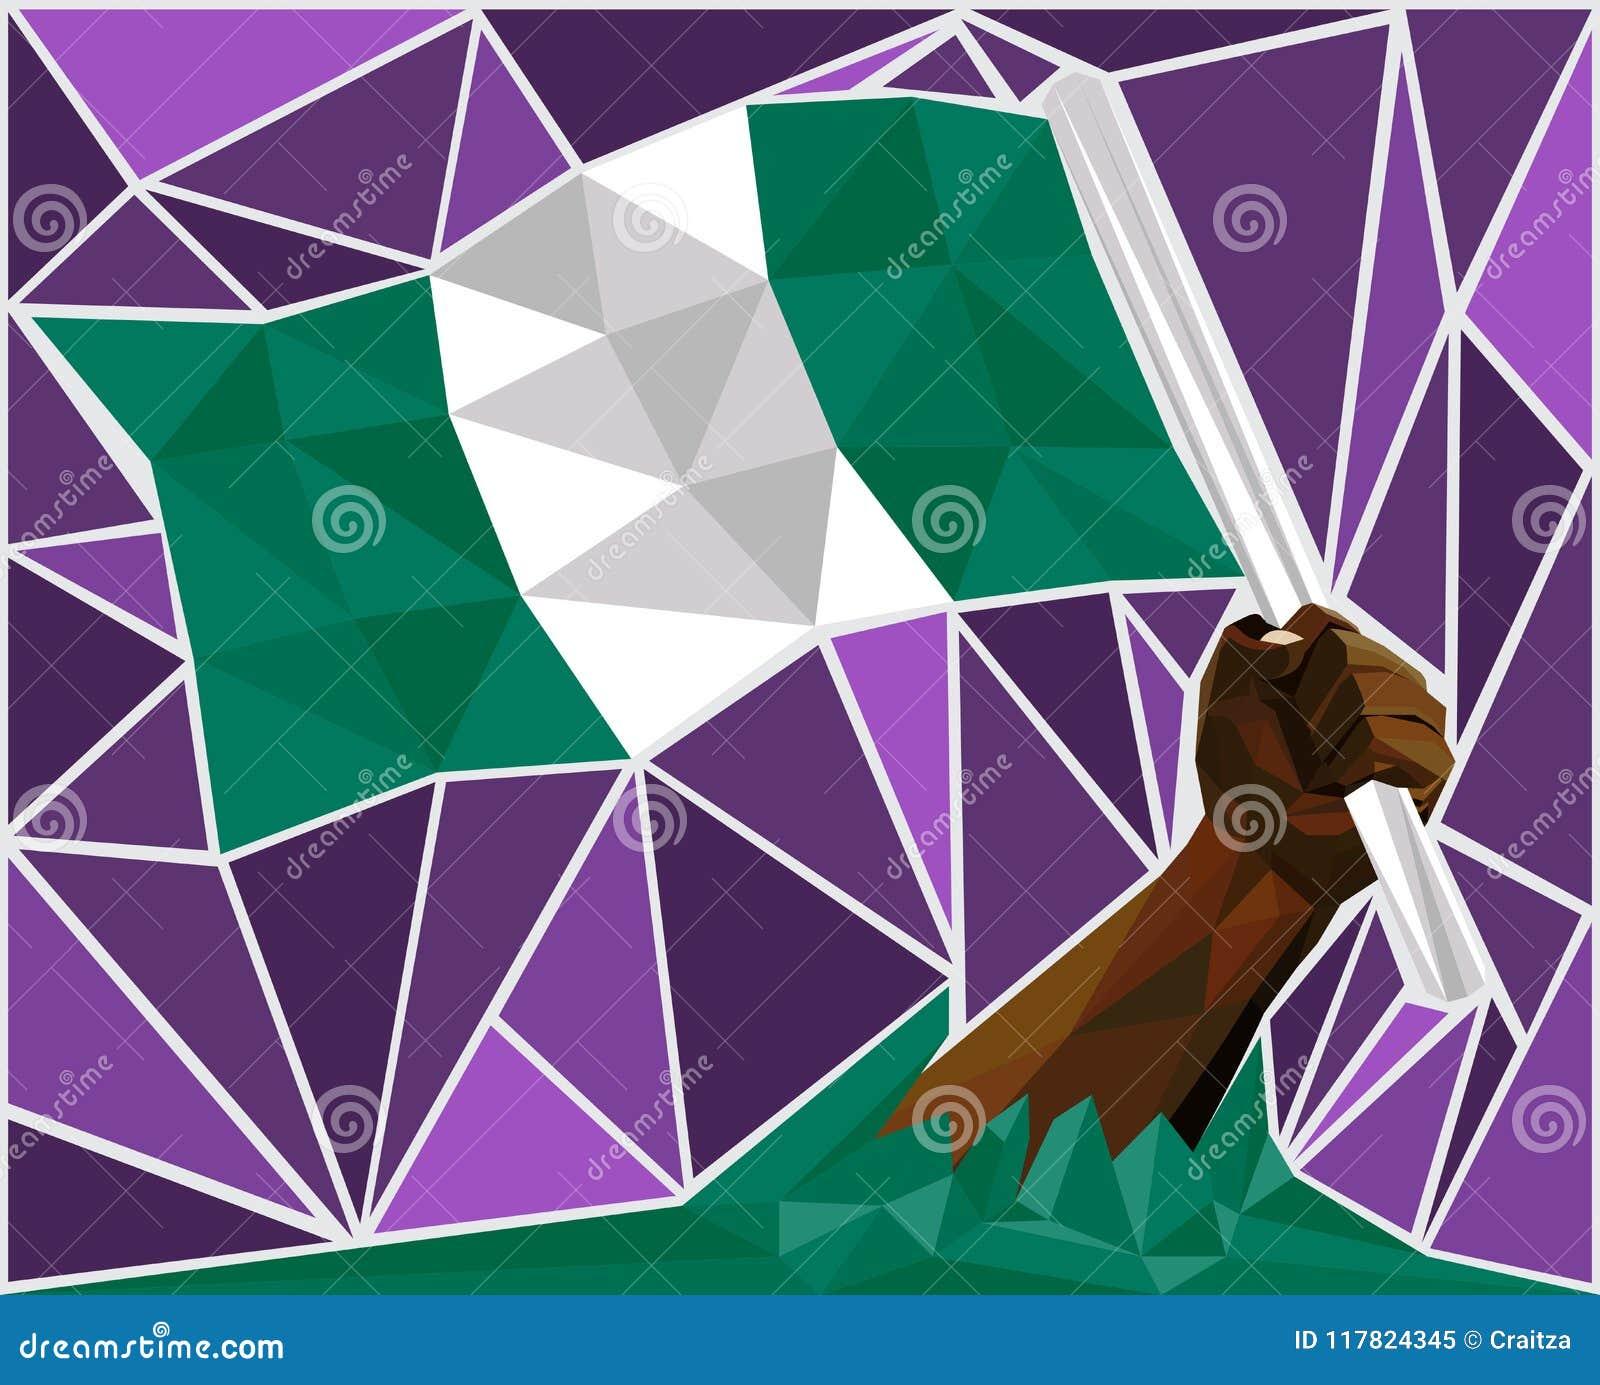 Download Powerful Black Man Hand Raising The Flag Of Nigeria Stock Illustration - Illustration of freedom, education: 117824345